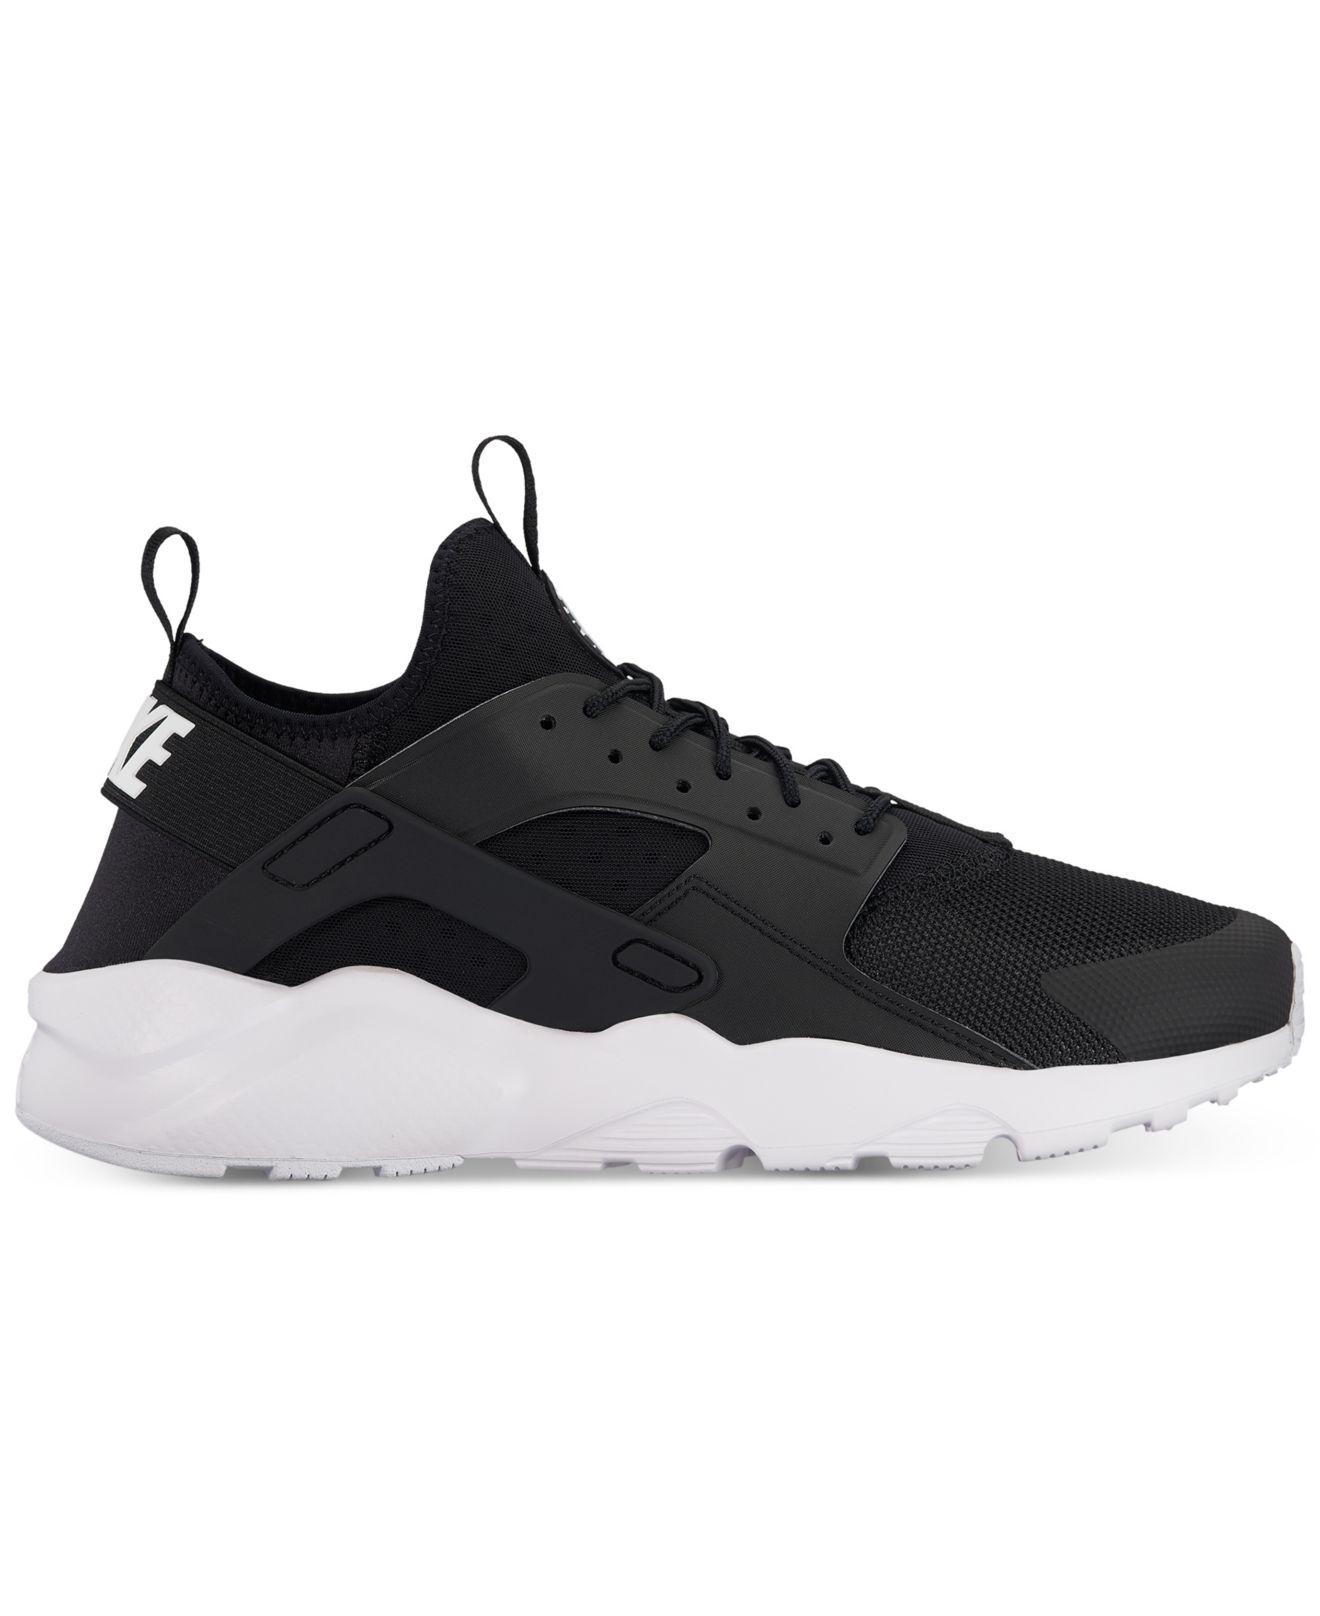 11f388e09345 Nike. Black Men s Air Huarache Run Ultra Casual Sneakers From Finish Line